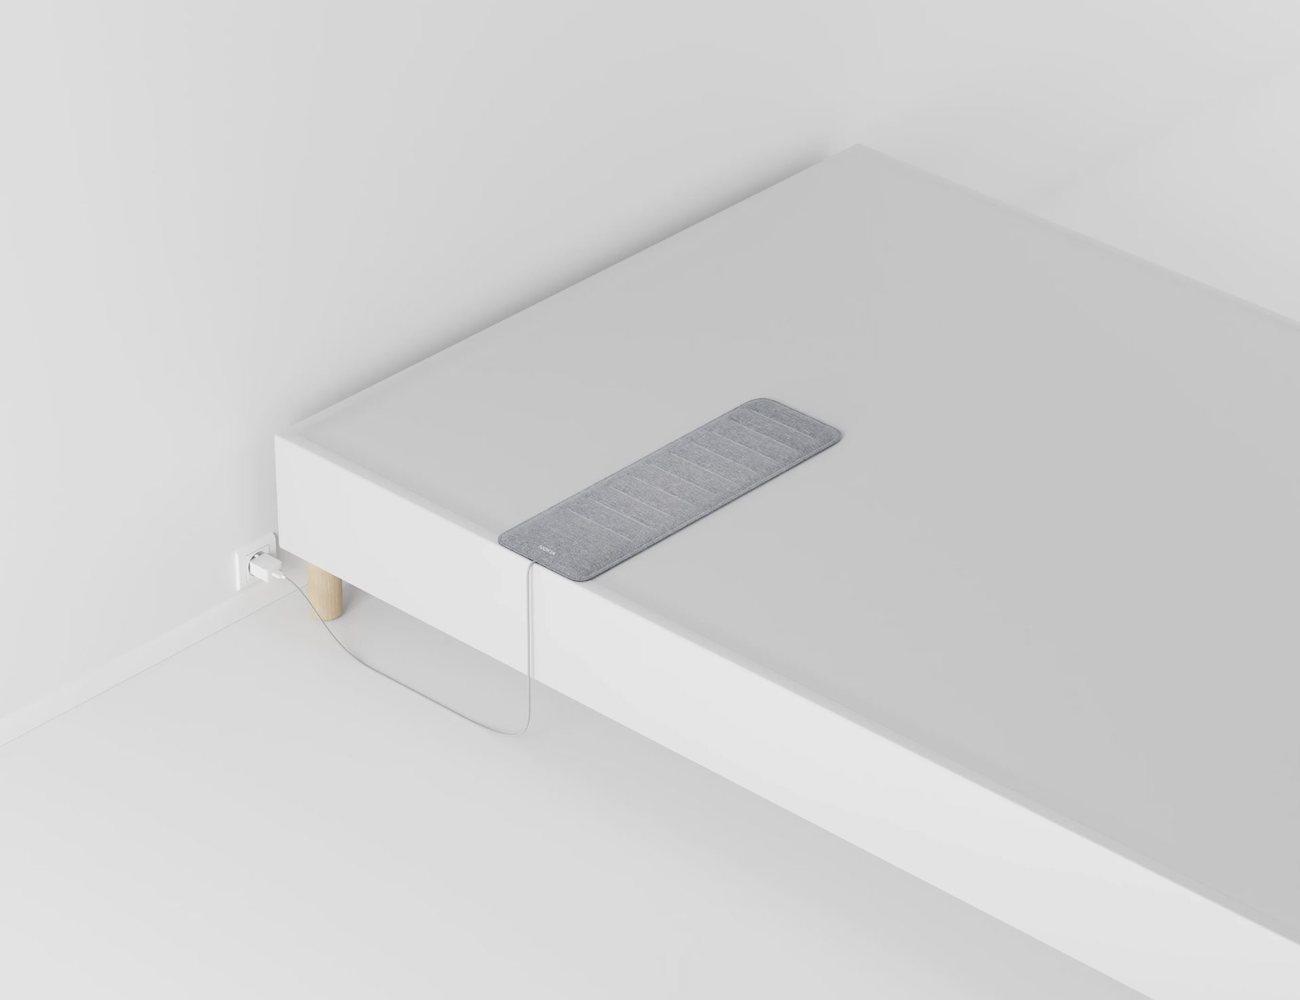 Withings Sleep Tracking Pad offers sleep apnea detection